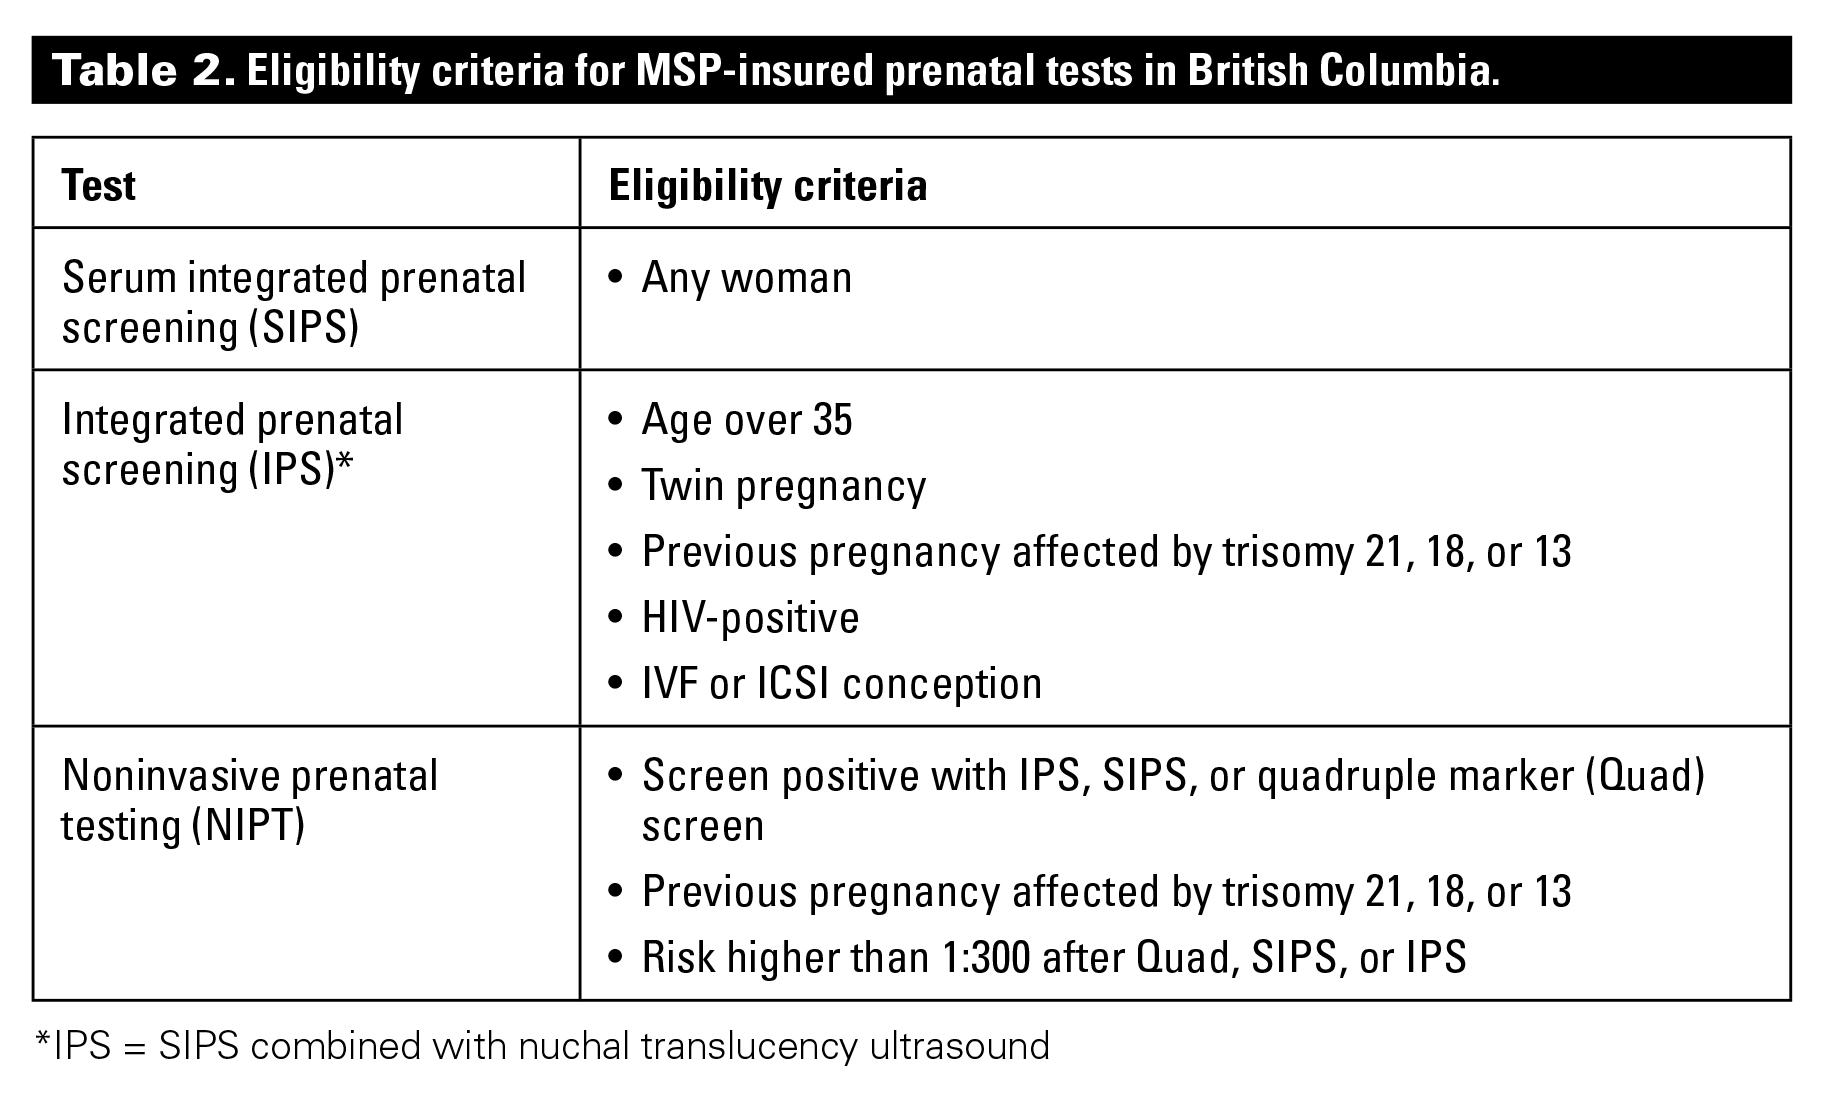 Prenatal screening options in British Columbia | British